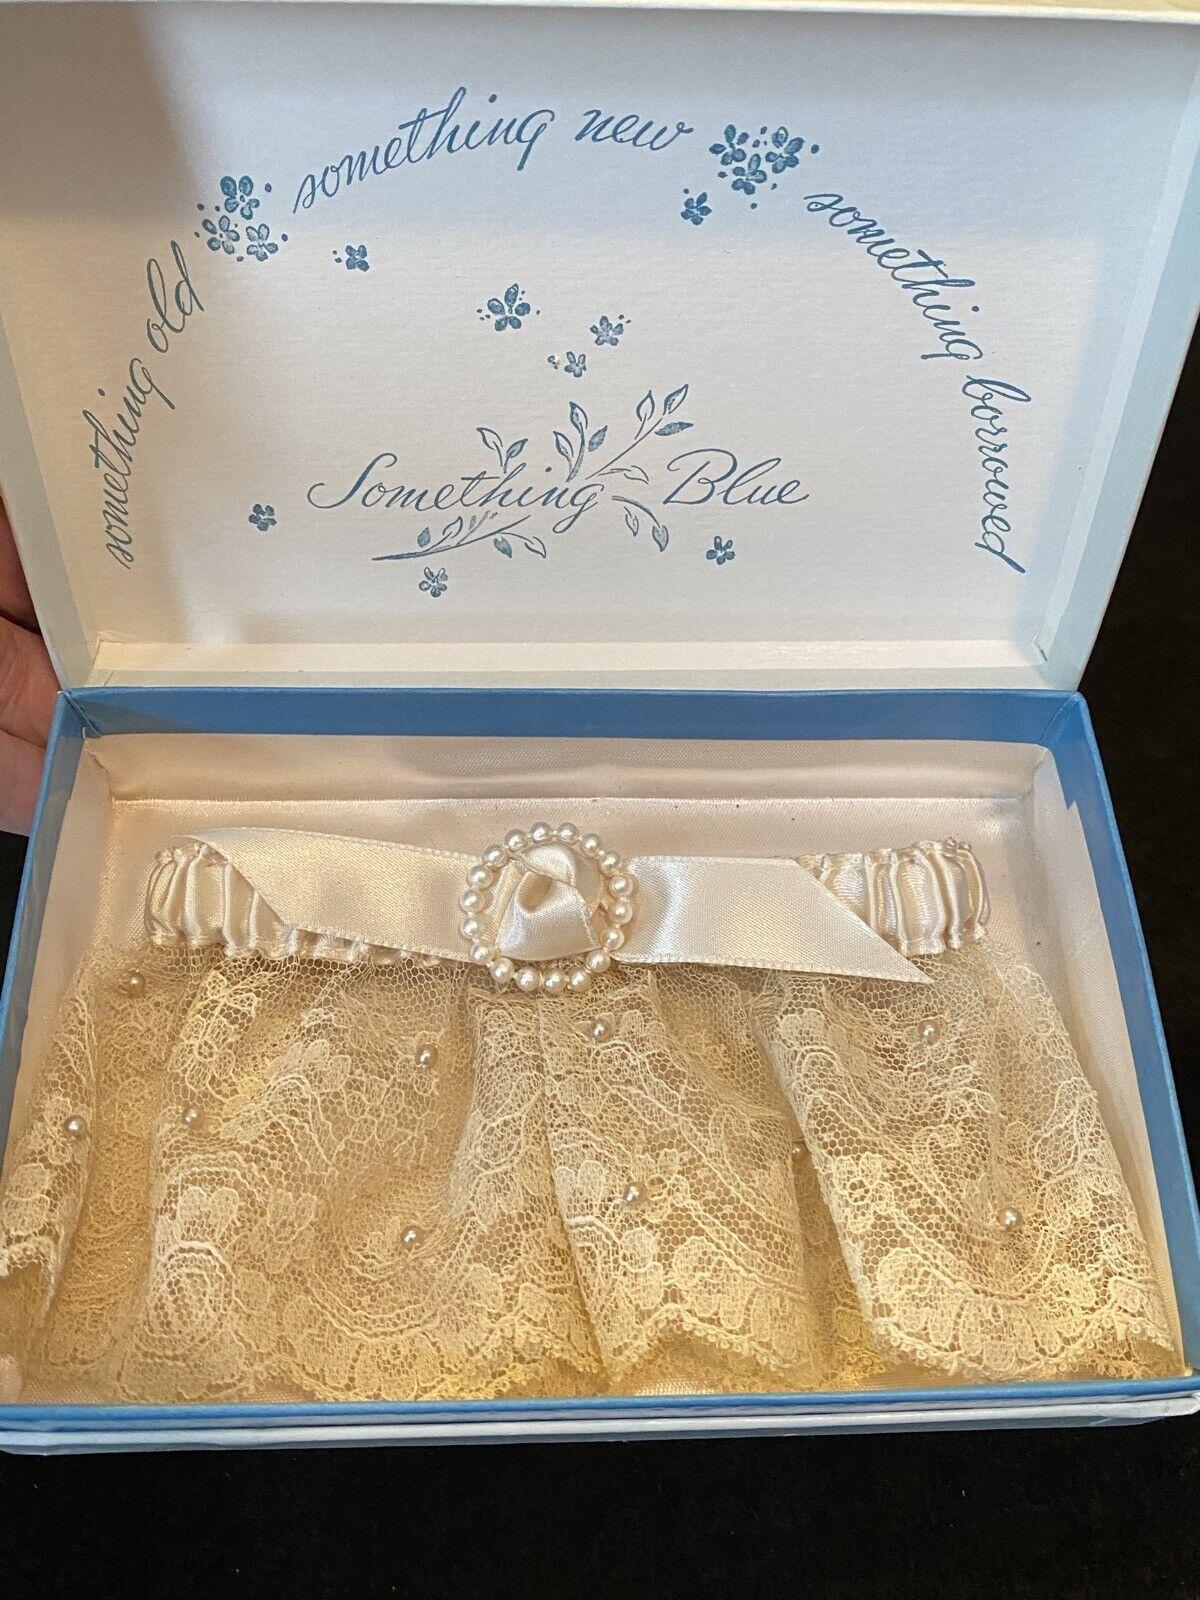 Vintage MCM Bridal Lace Offwhite Ladies Wedding Garter by Ann Seton Designs NIP